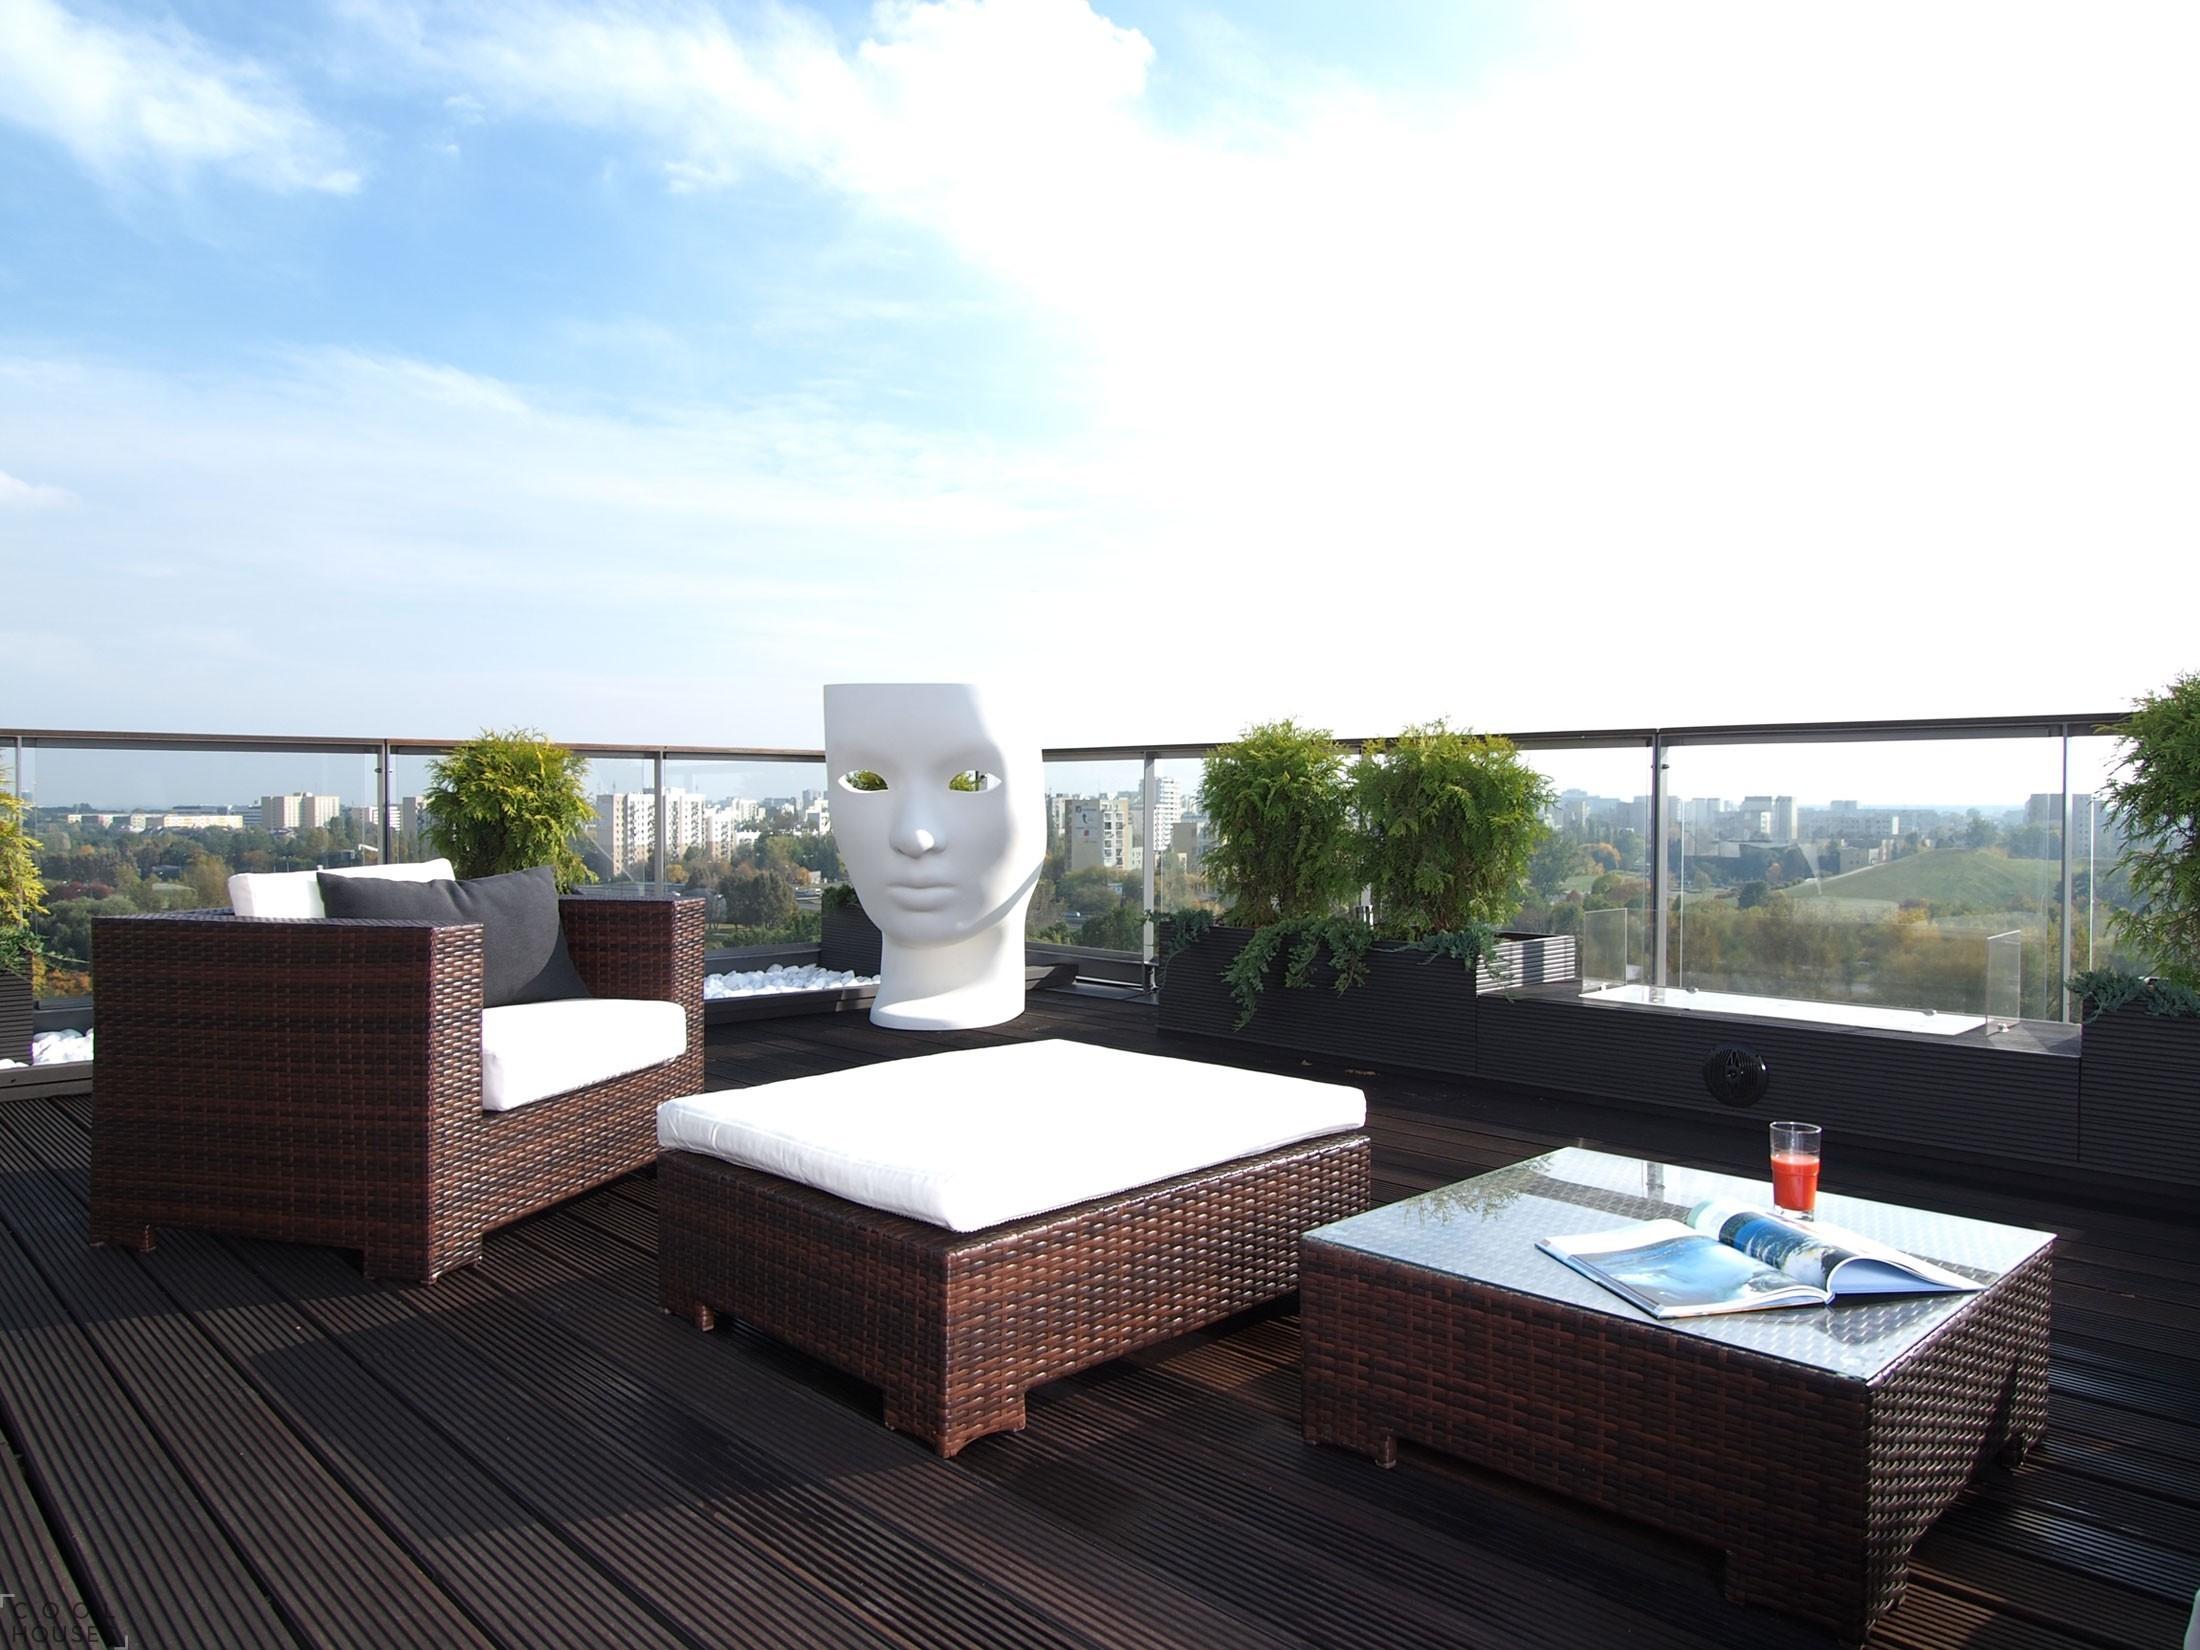 Balkon Gestalten Modern New Dekoration Ideen Balkonbepflanzung